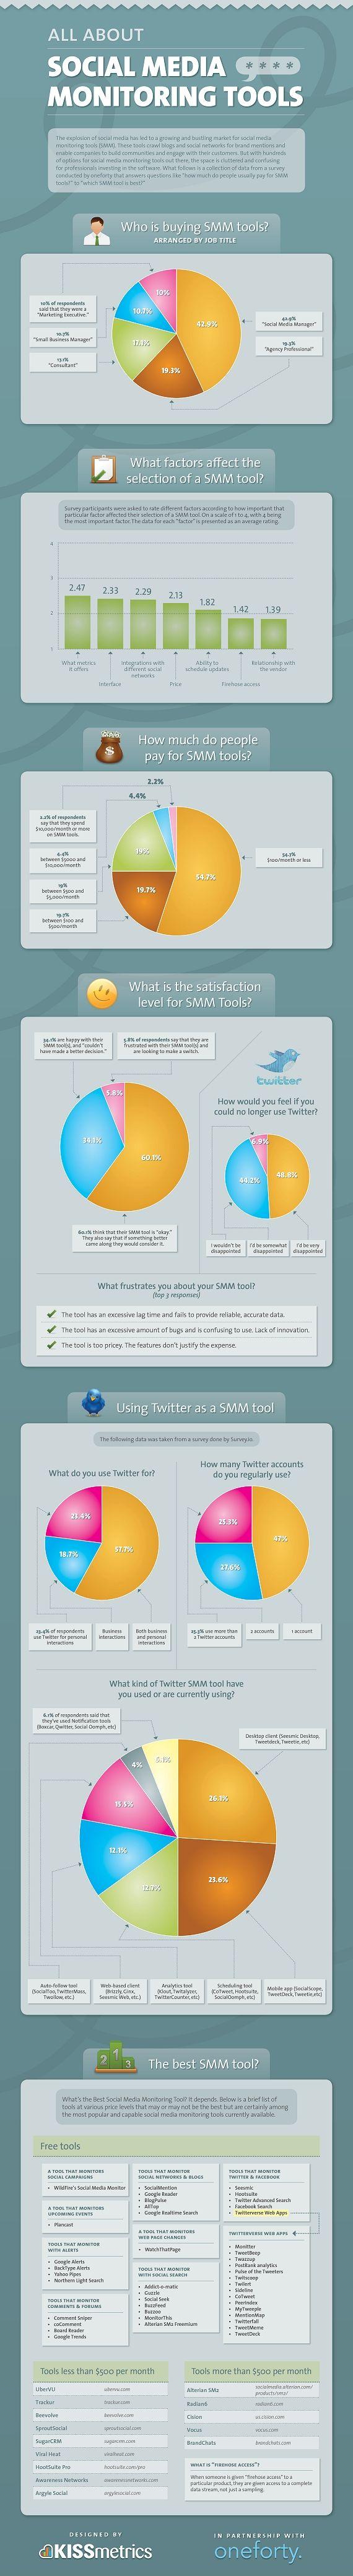 All about social media monitoring tools: Tools Infographic, Social Media, Media Marketing, Media Infographic, Socialmedia, Infographics, Medium